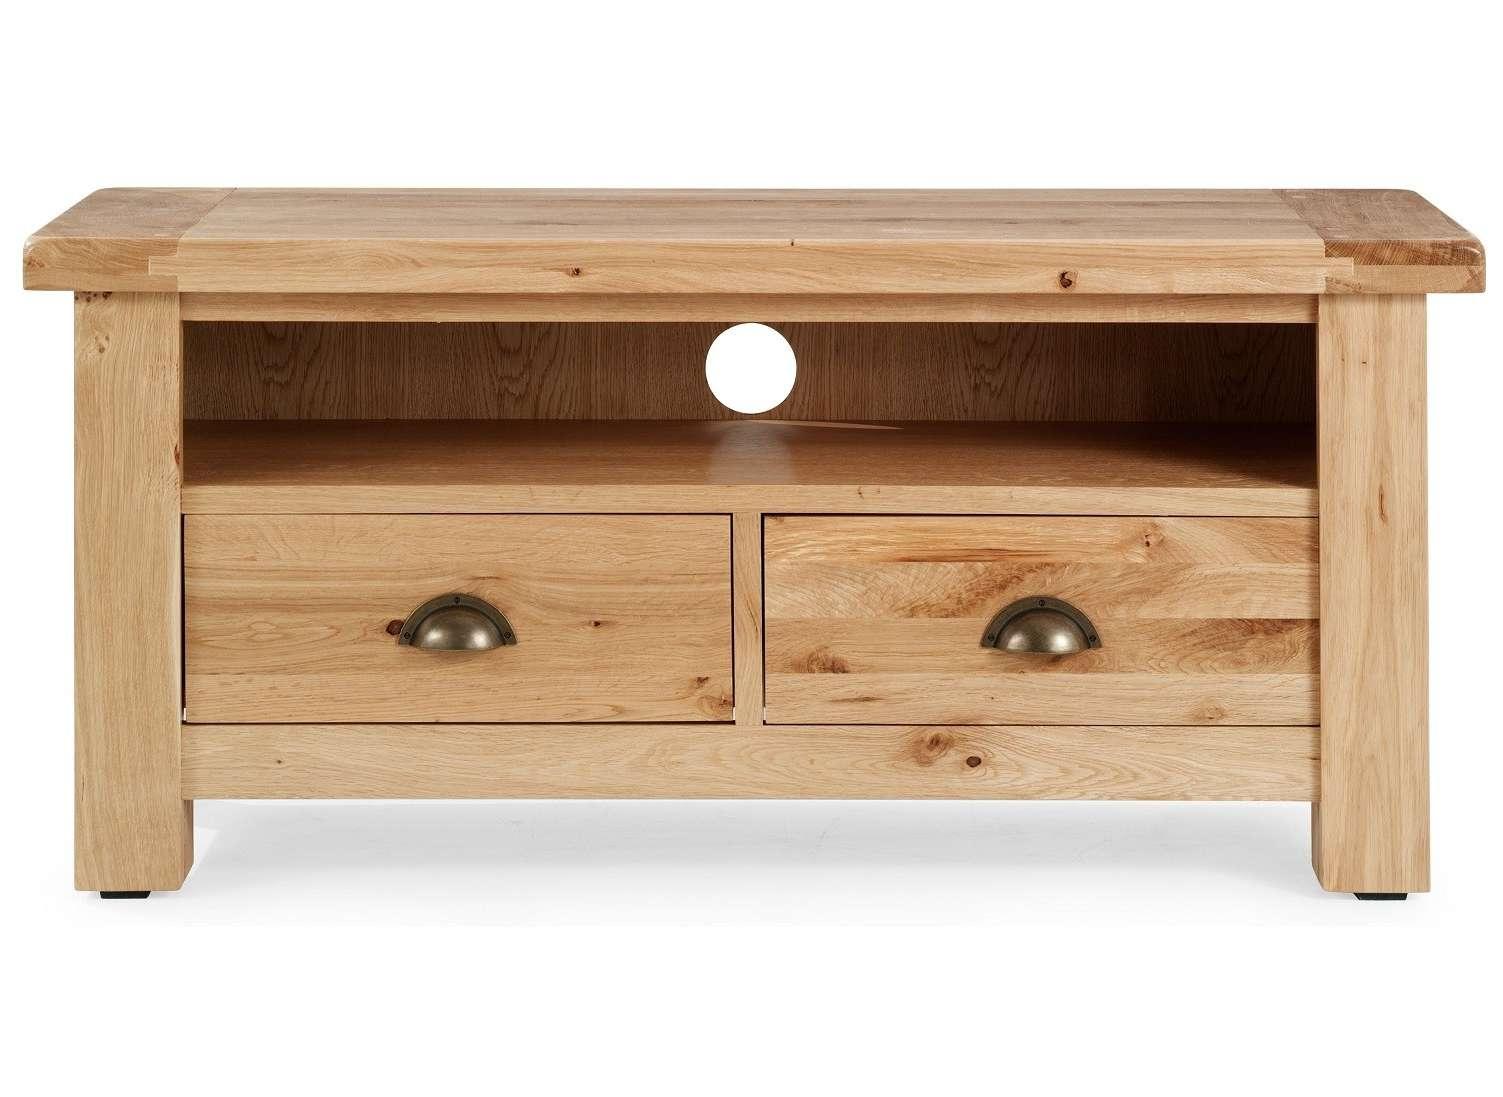 Normandy Rustic French Oak Tv Cabinet | Oak Furniture Uk Inside Rustic Corner Tv Cabinets (View 15 of 20)